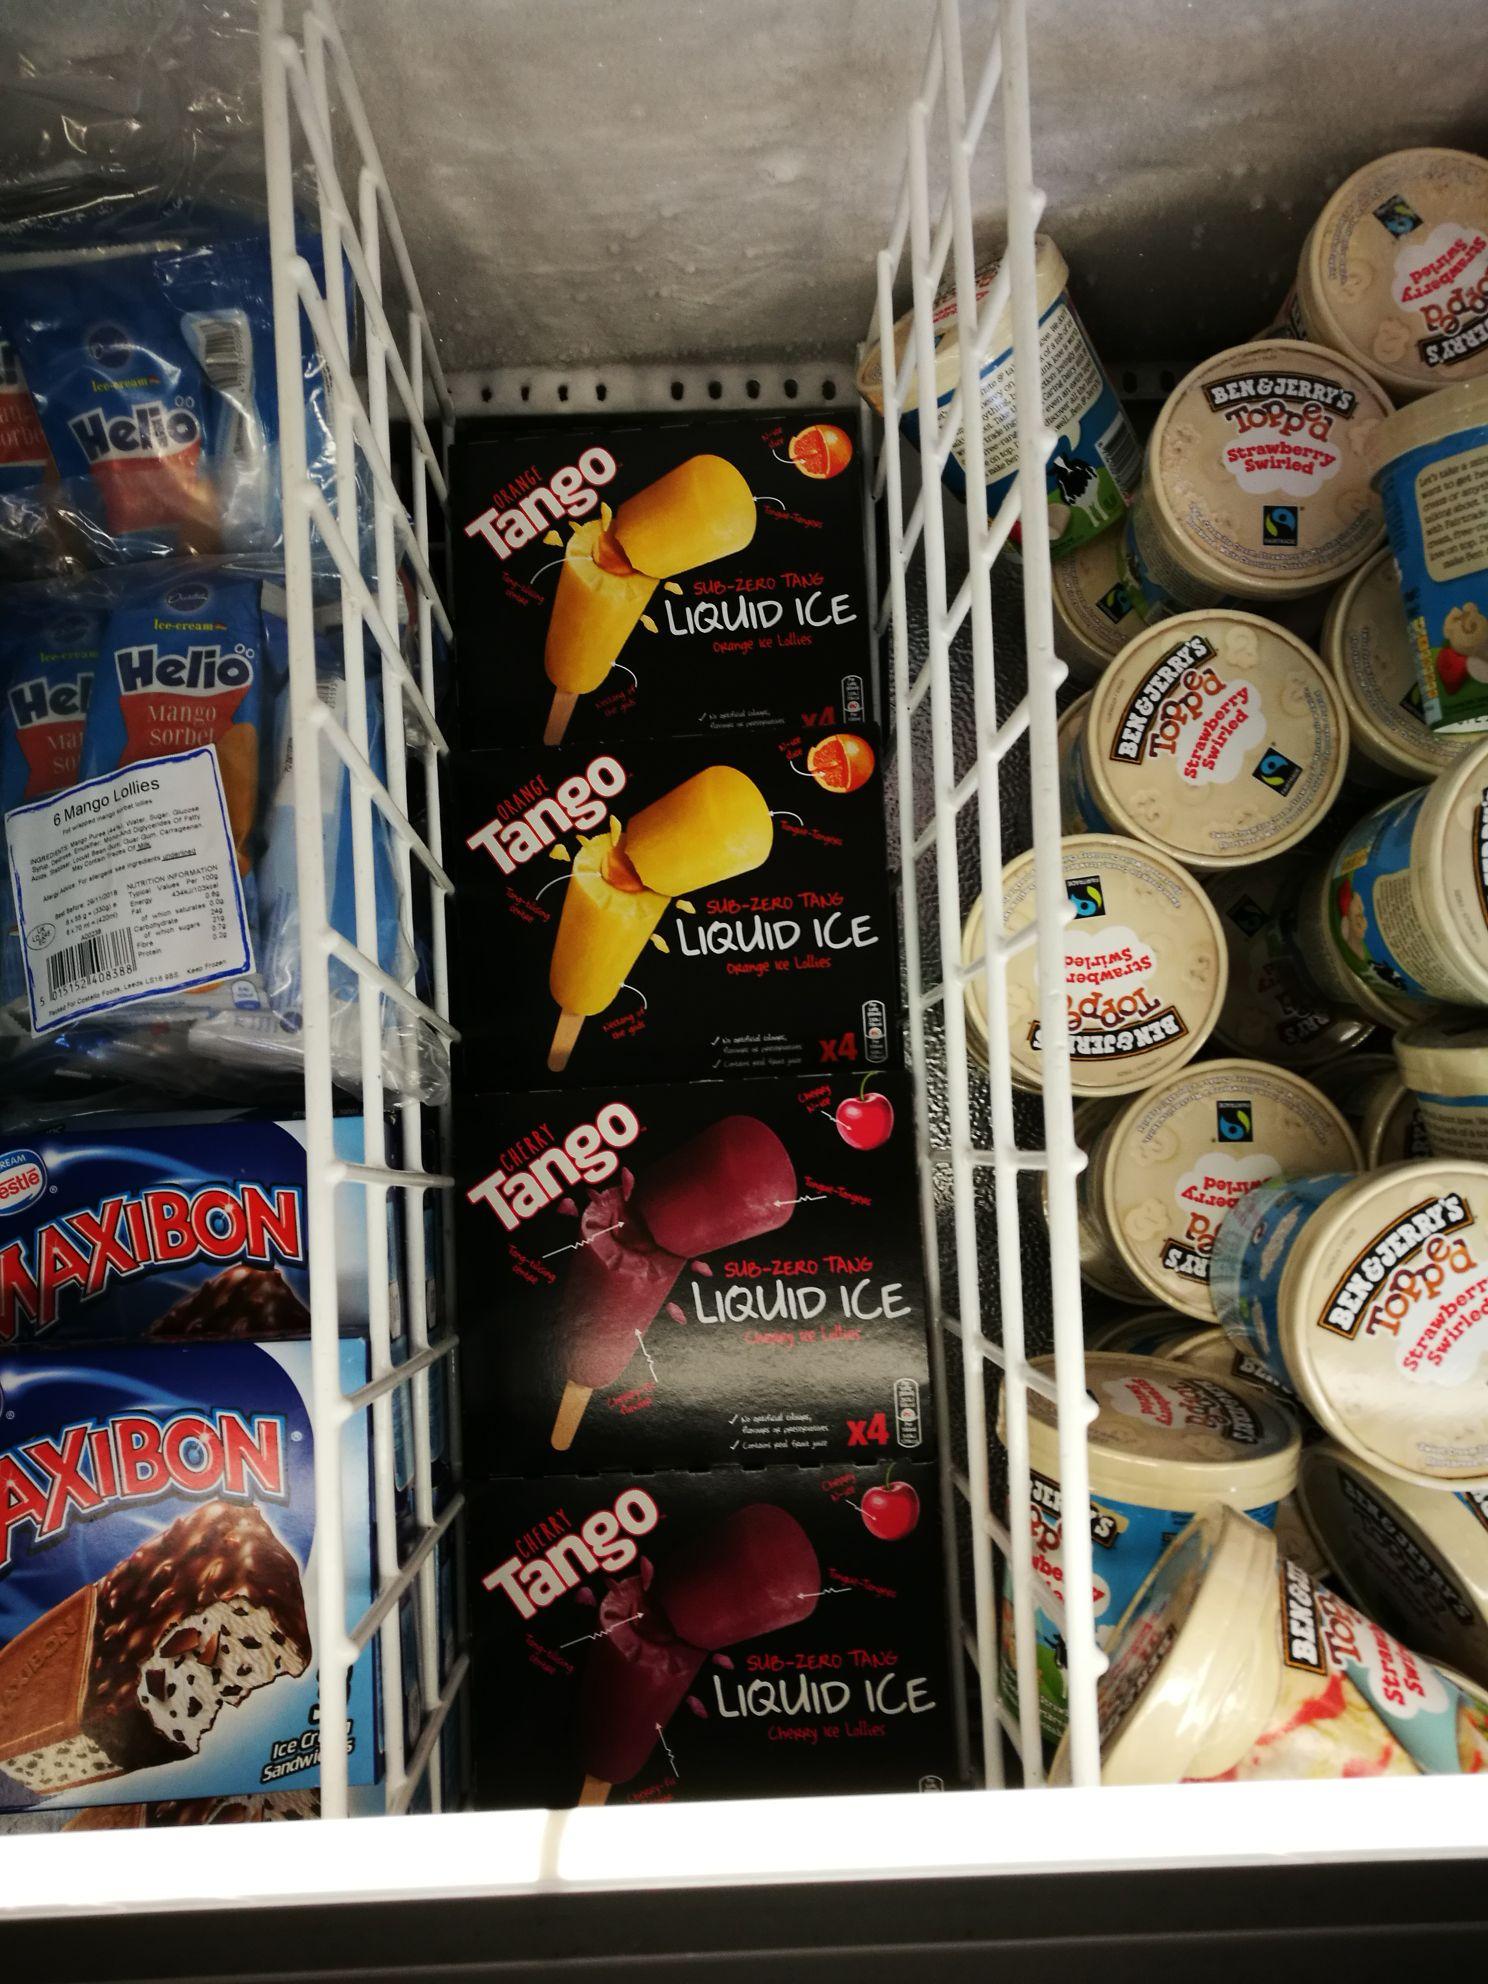 Tango ice lollies £1 @ heron foods